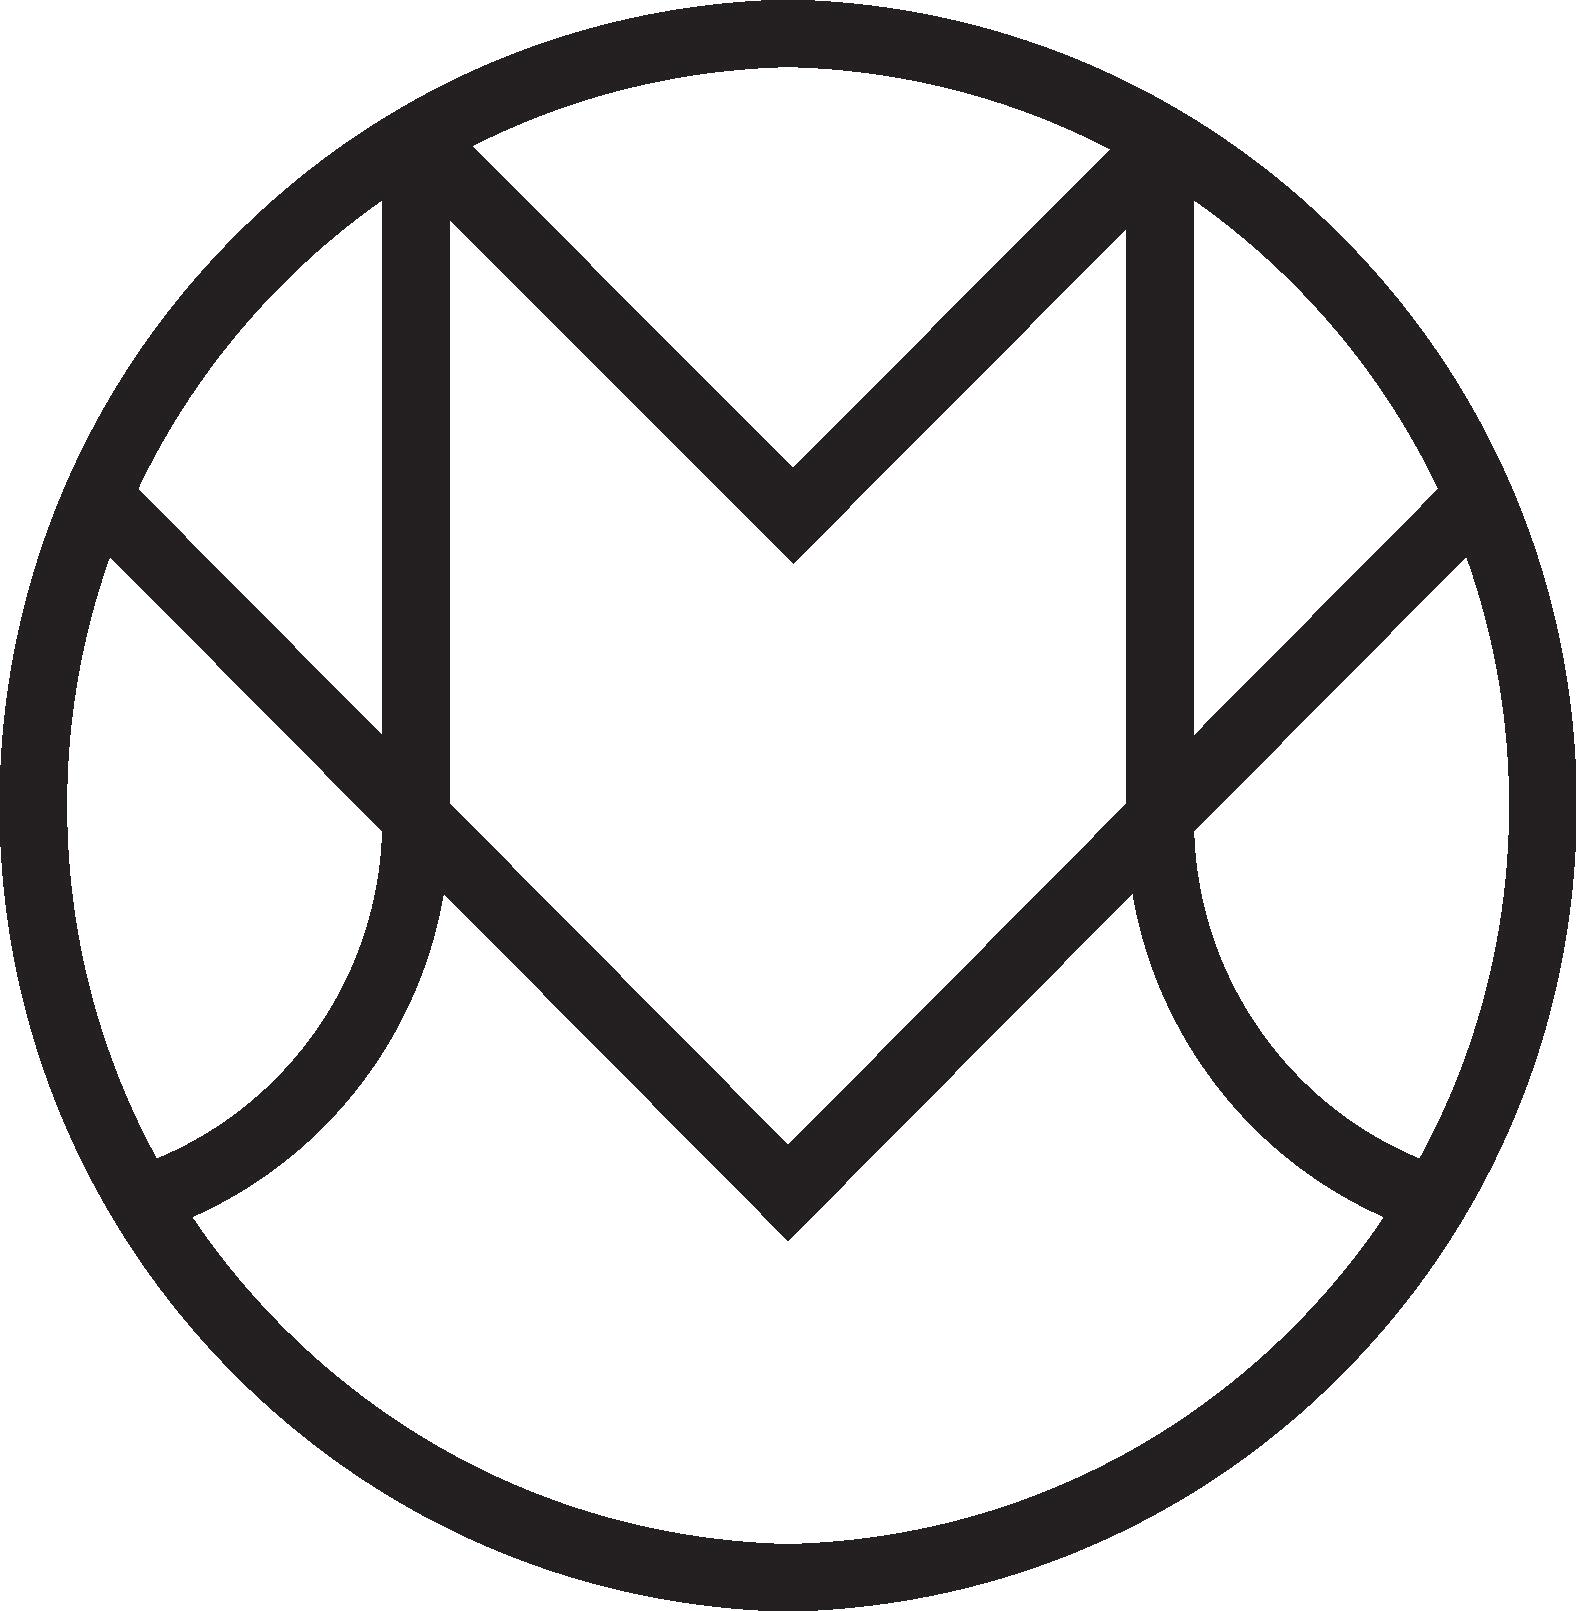 Melissa Mills - Brandmark_transparent_black.png